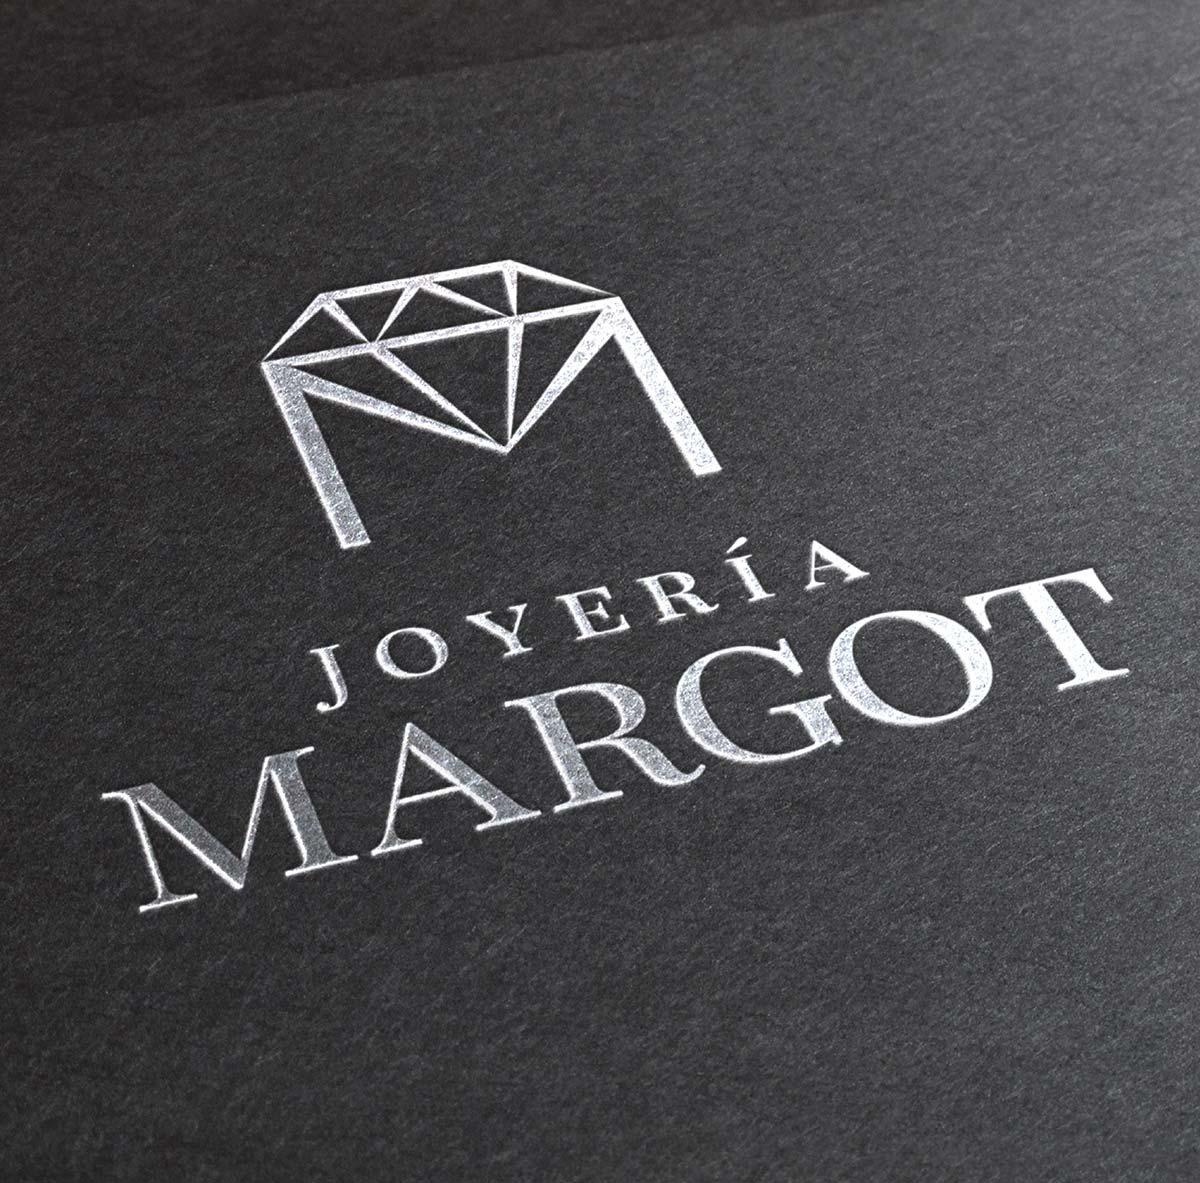 Diseño de logo para joyeria